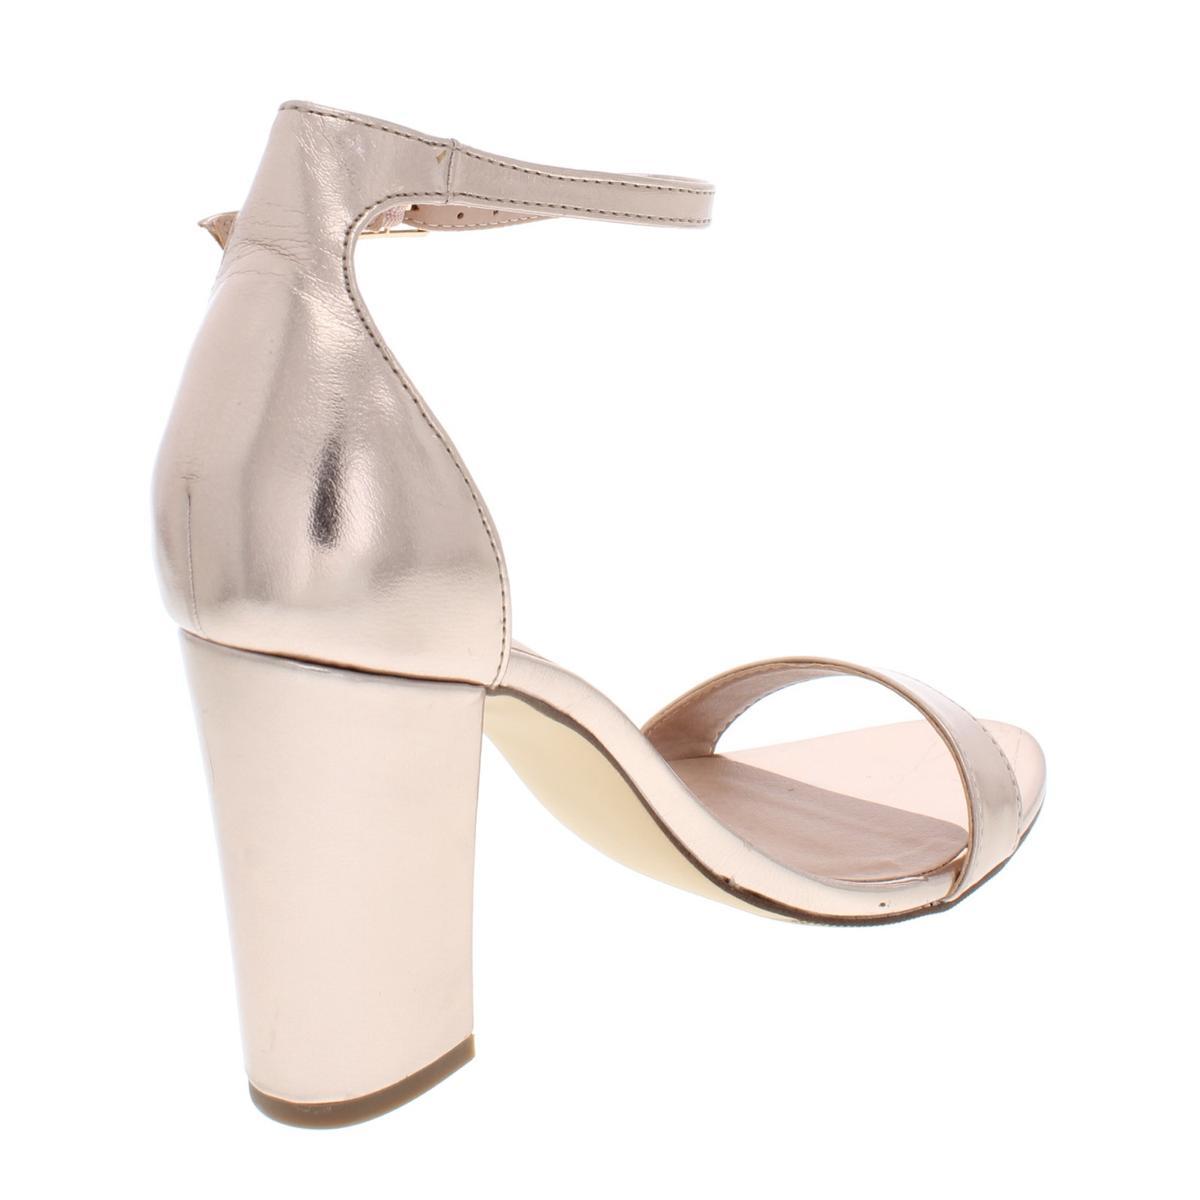 Madden-Girl-Womens-Beella-Heels-Dress-Sandals-Shoes-BHFO-0922 thumbnail 12